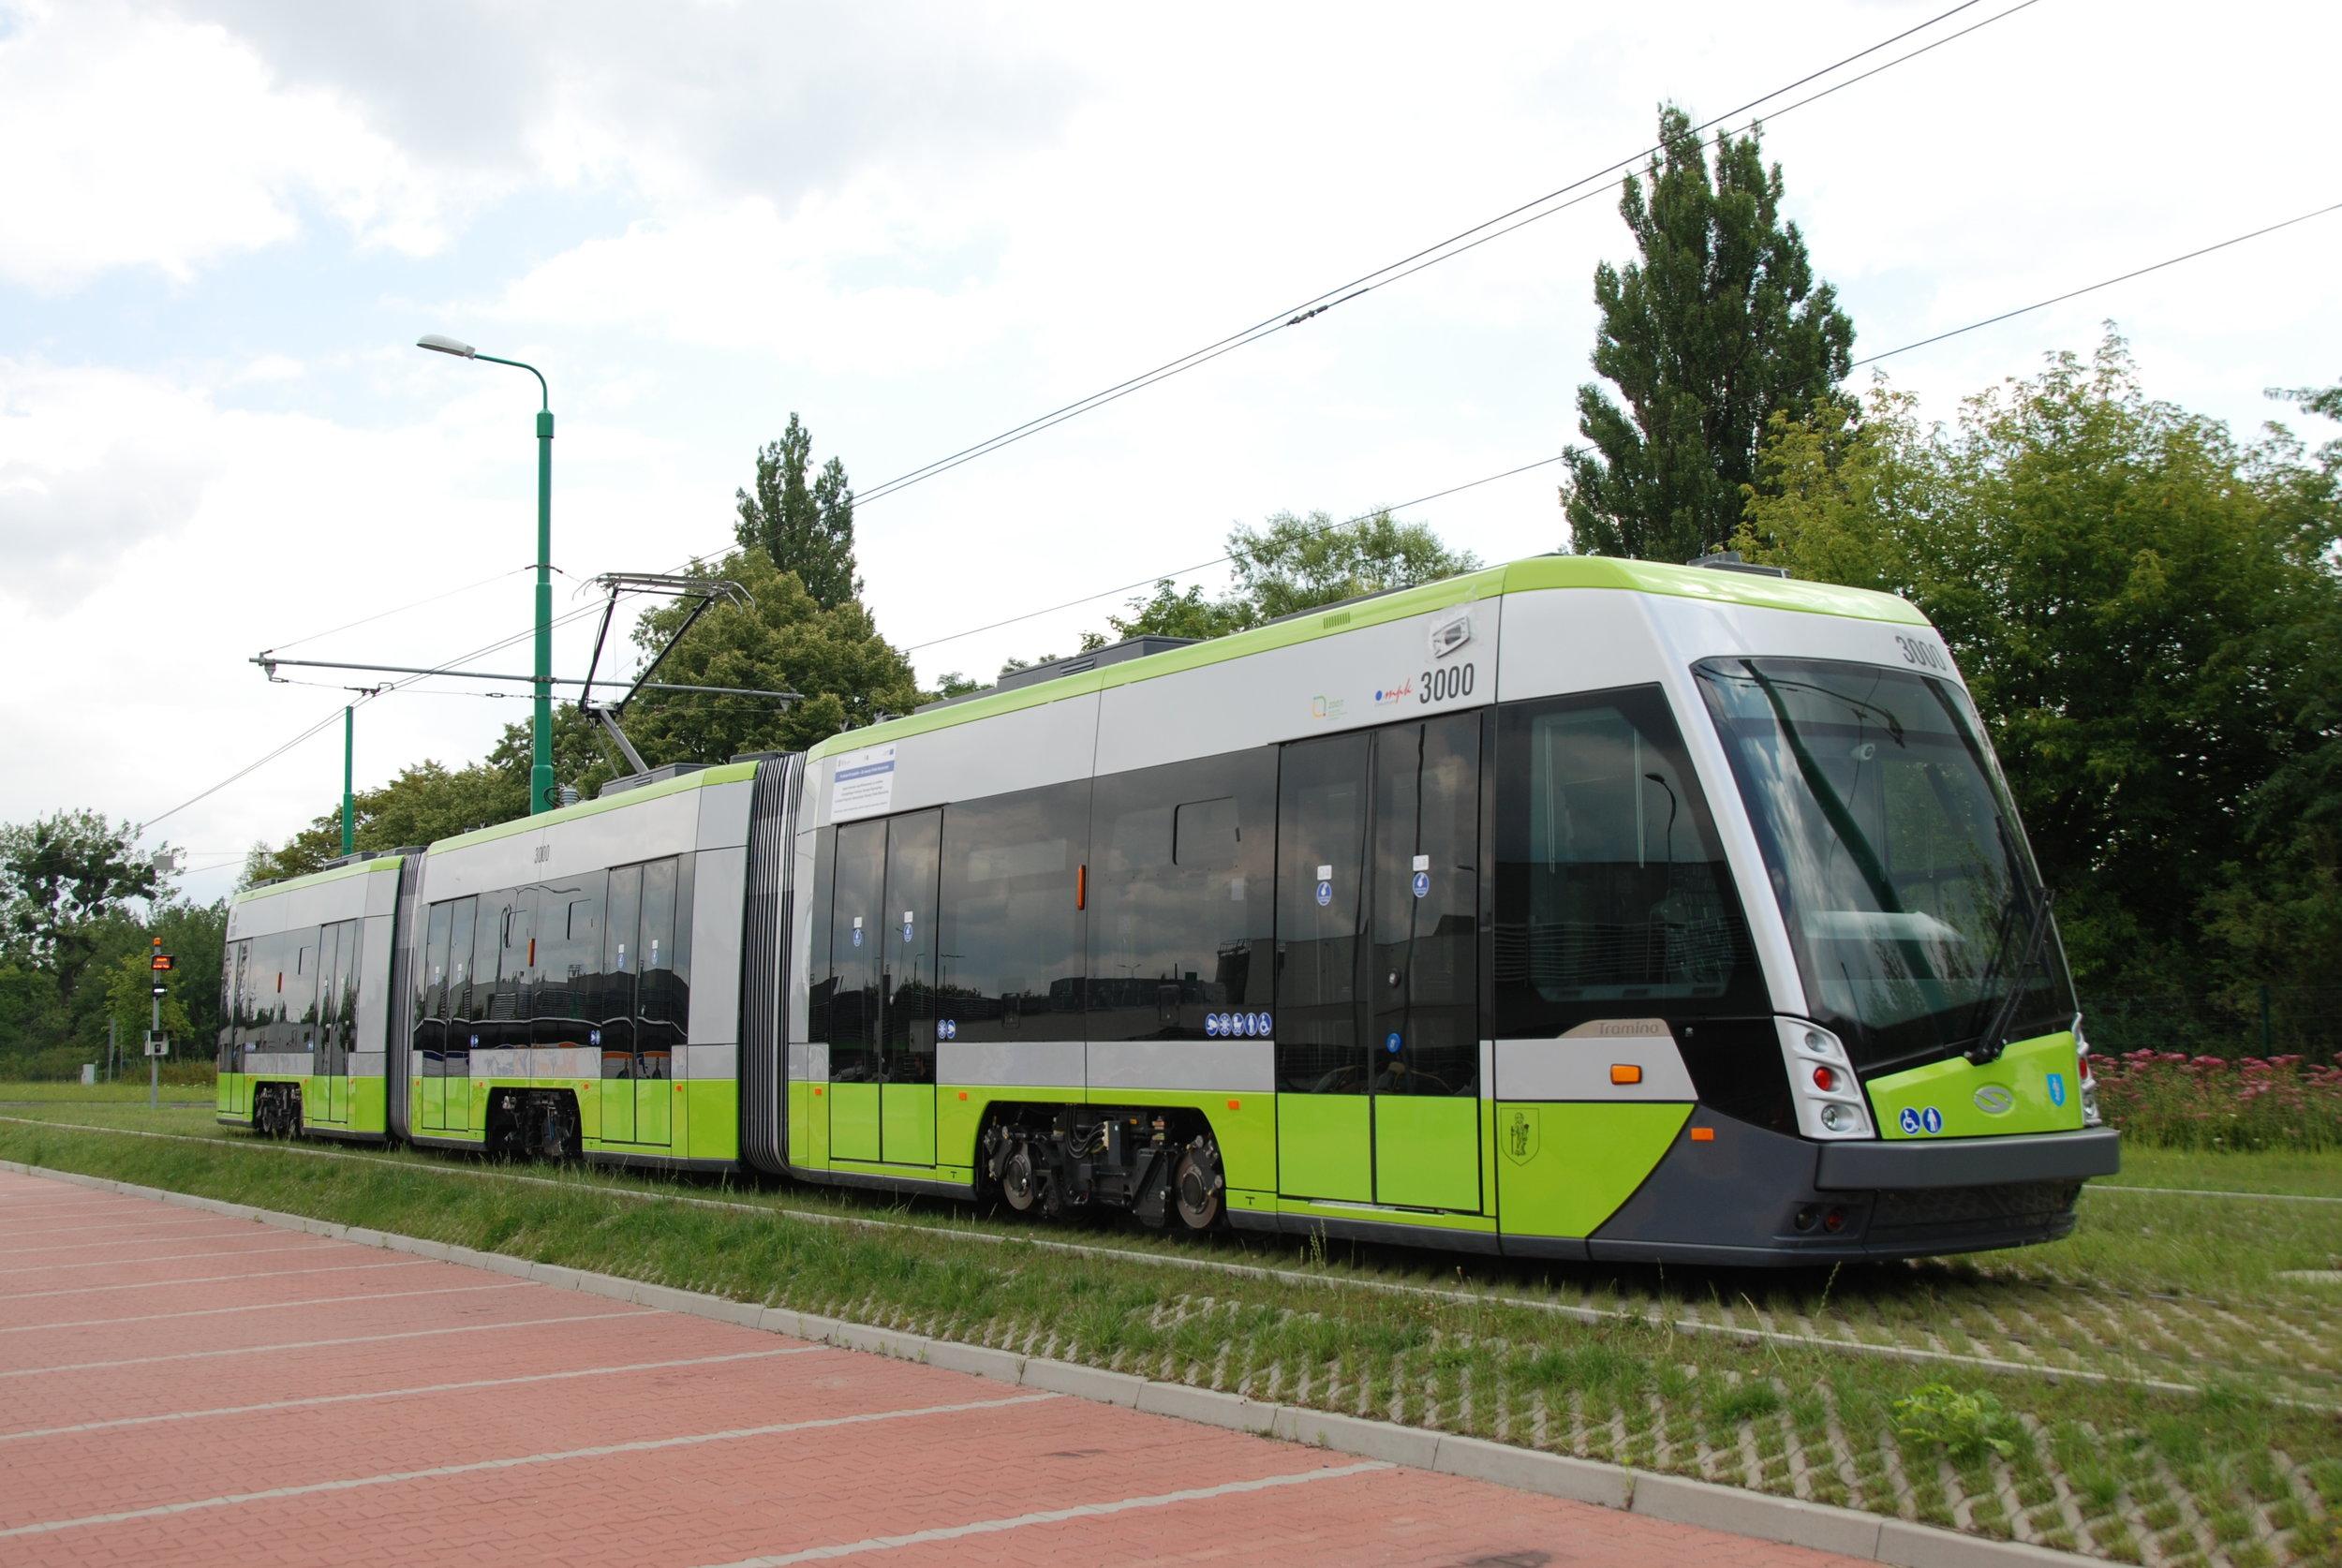 Solaris Tramino S111o pro Olsztyn. (foto: Libor Hinčica)